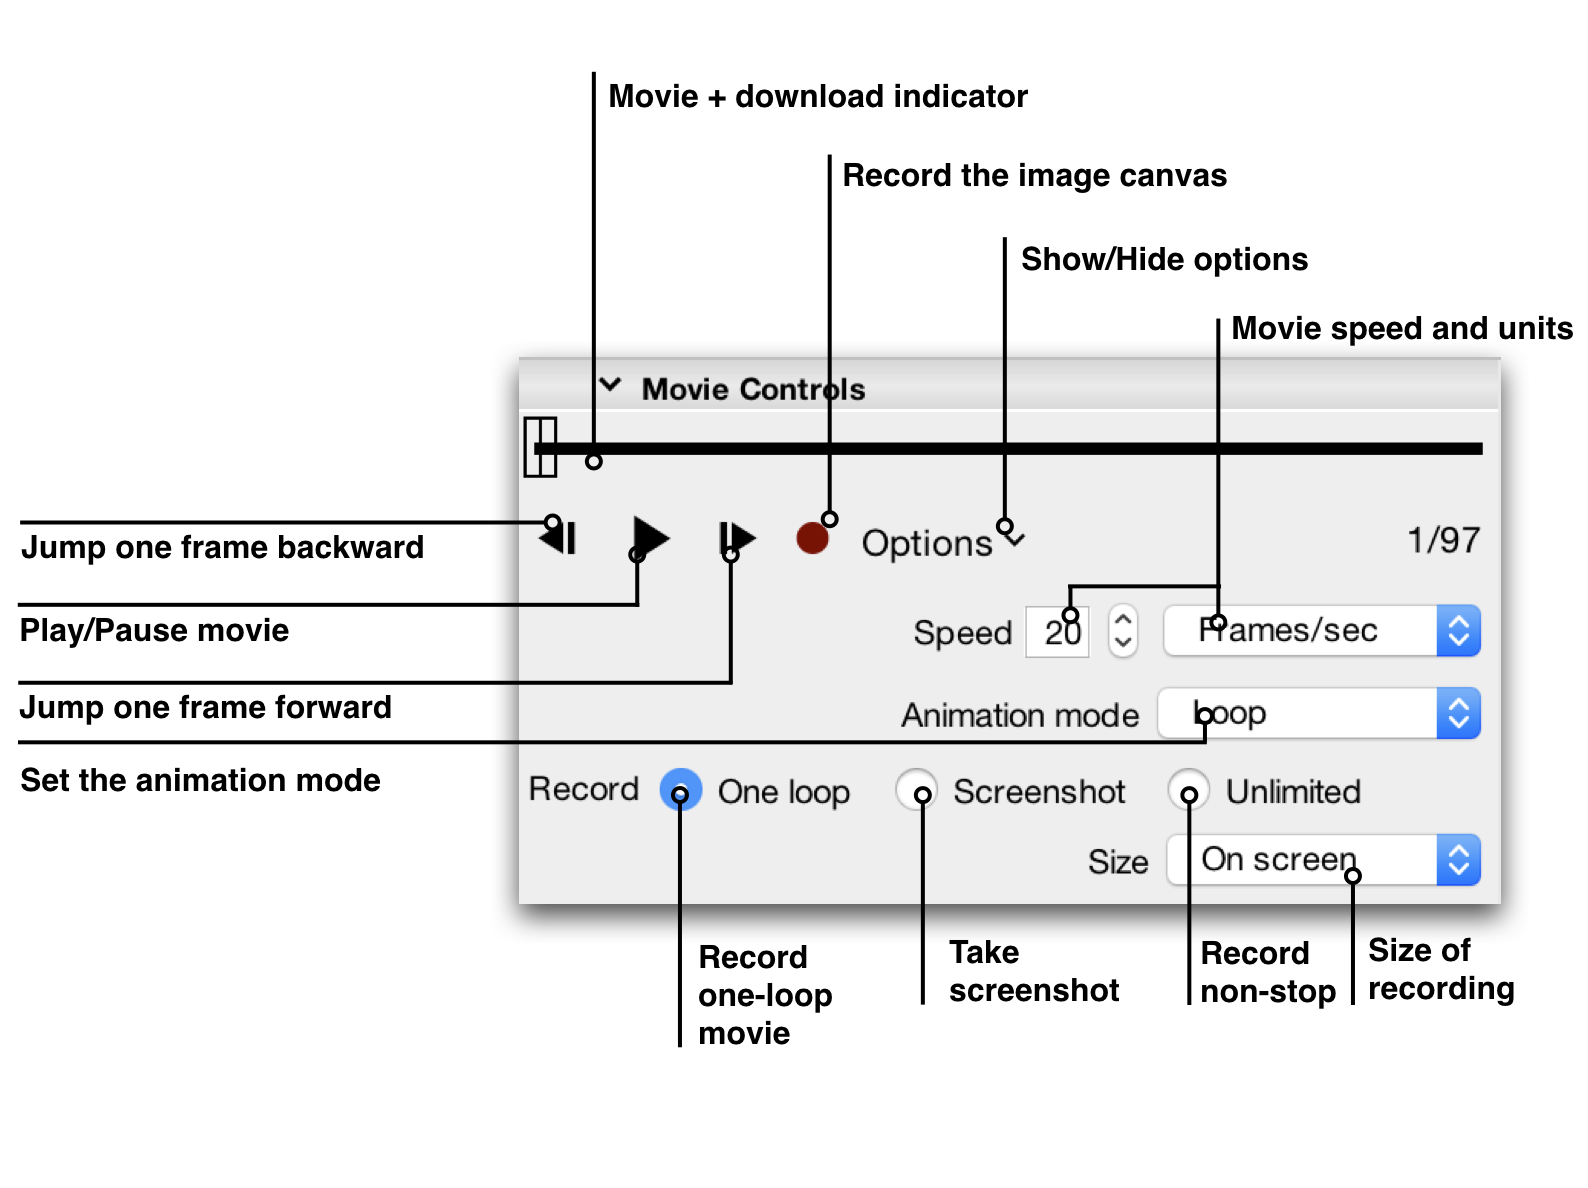 JHelioviewer User Manual